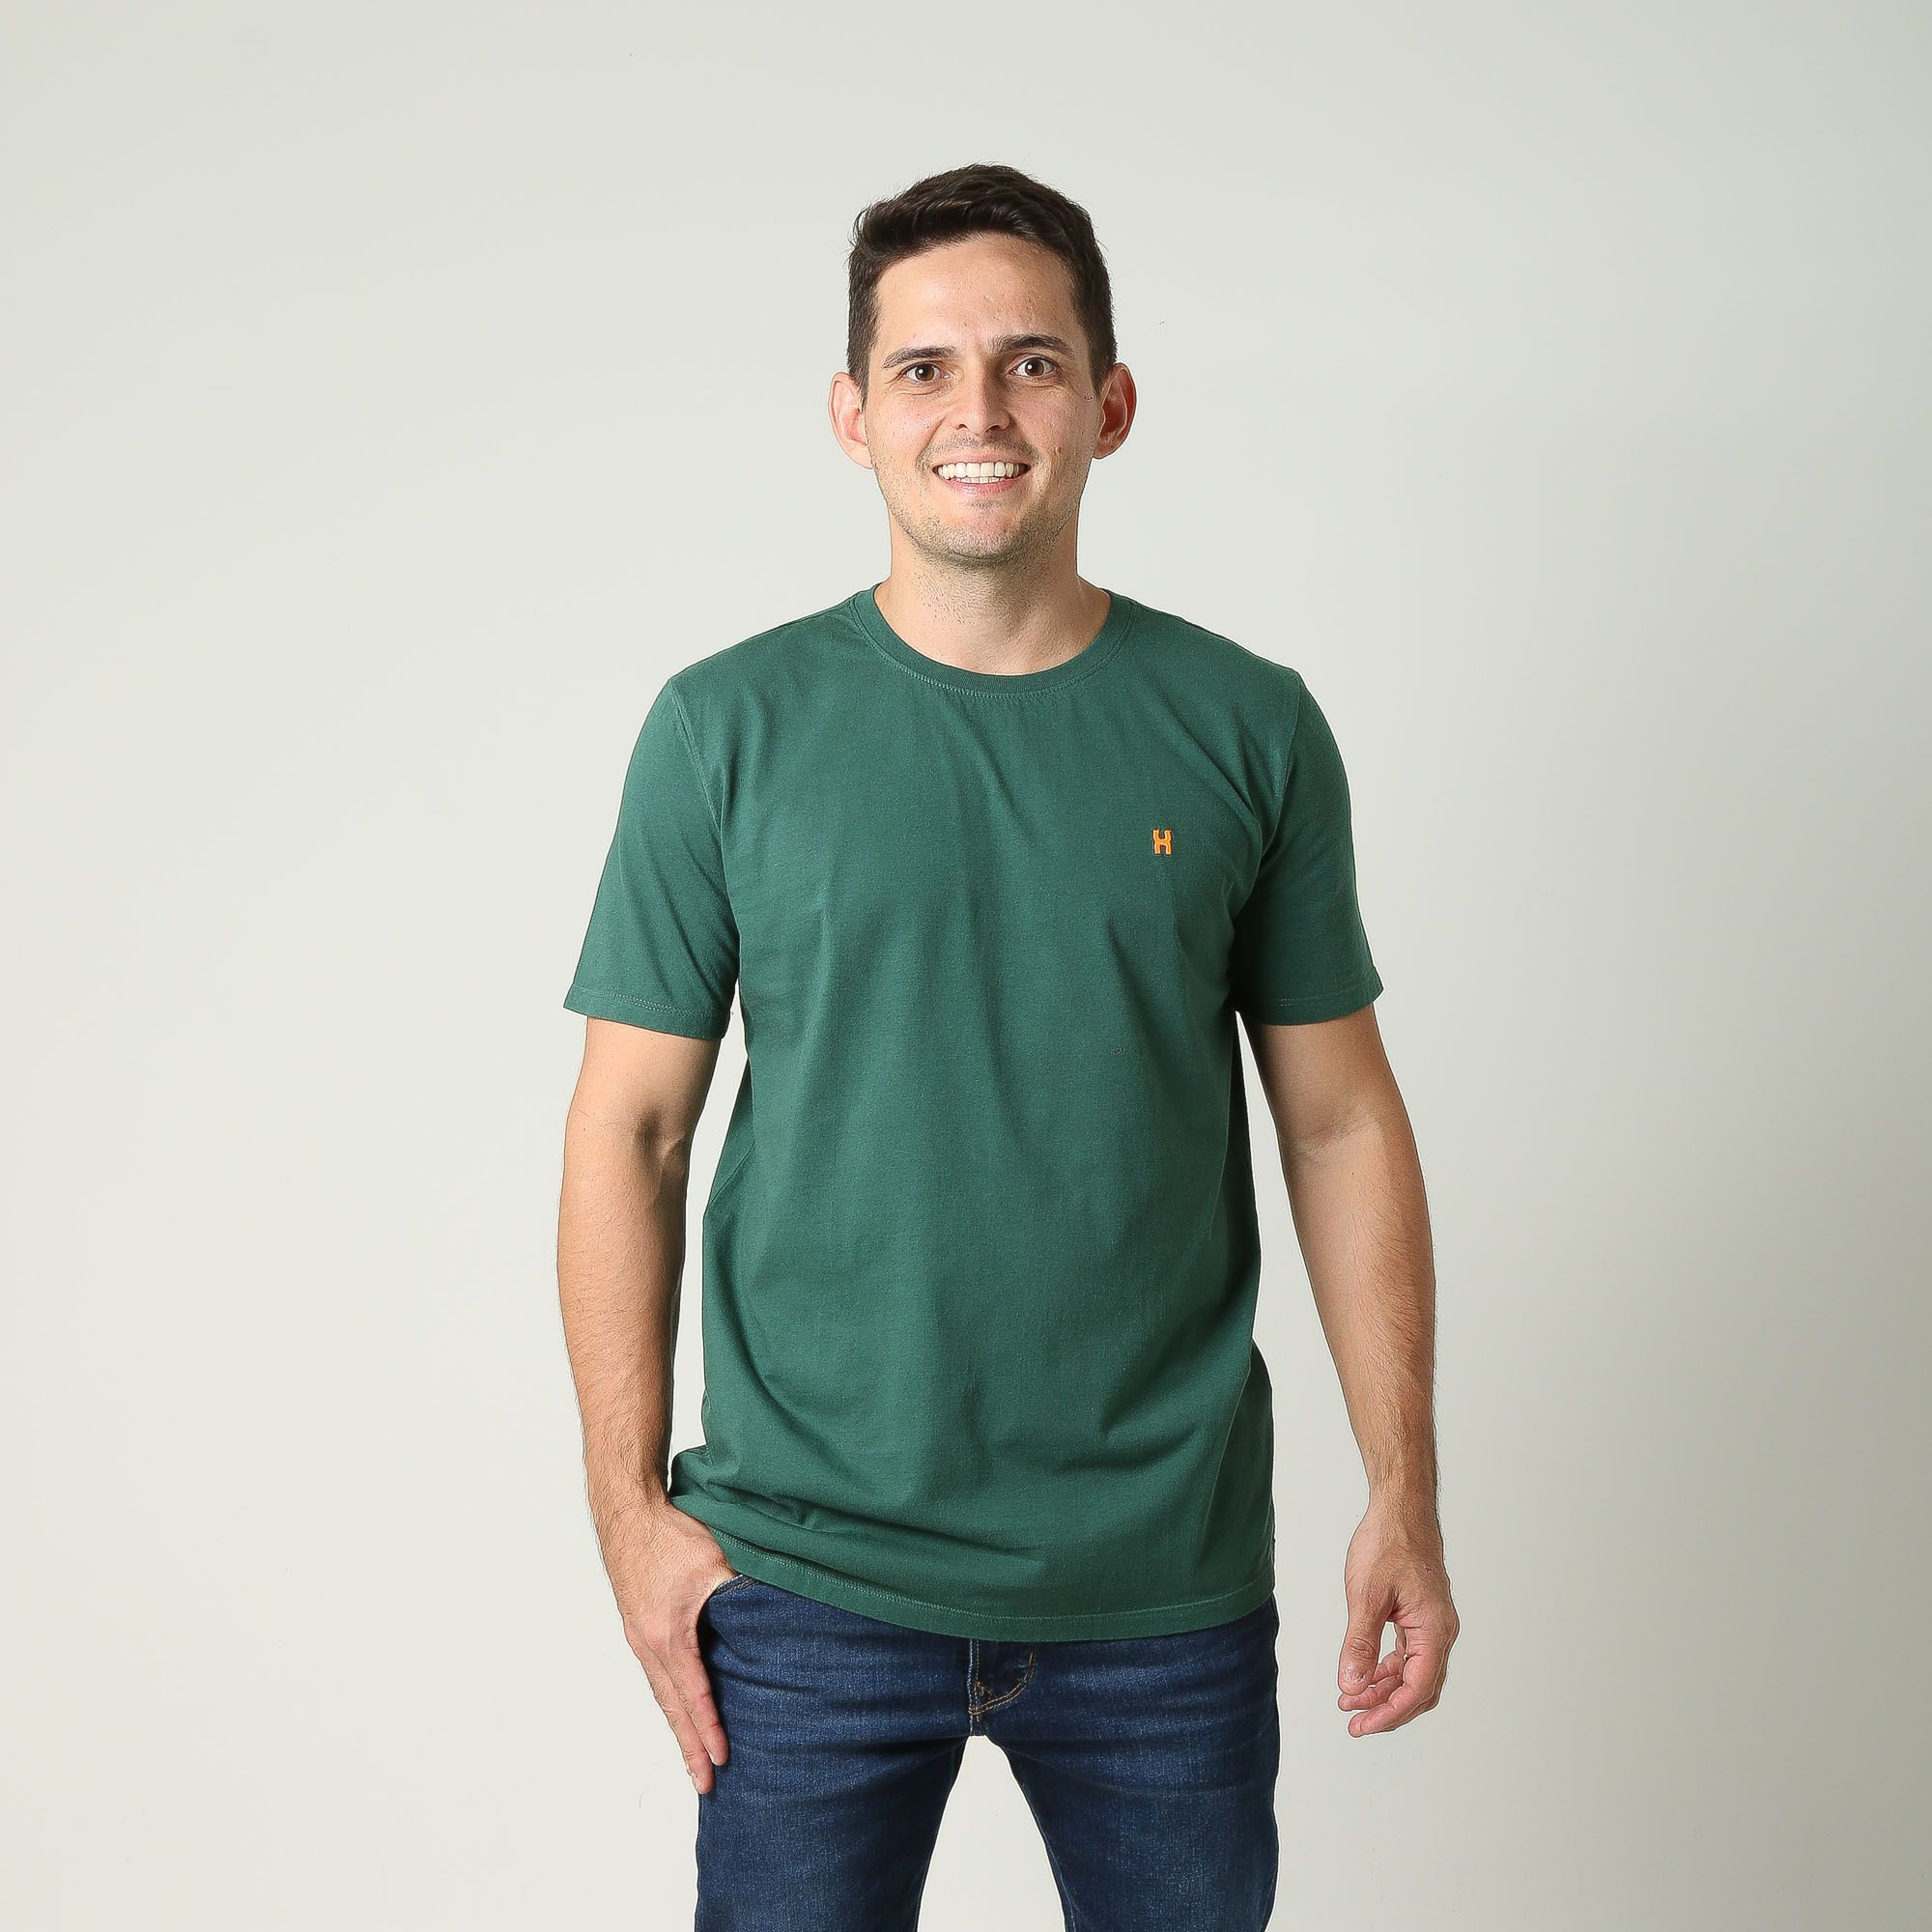 Camiseta Masculina TXC 1973